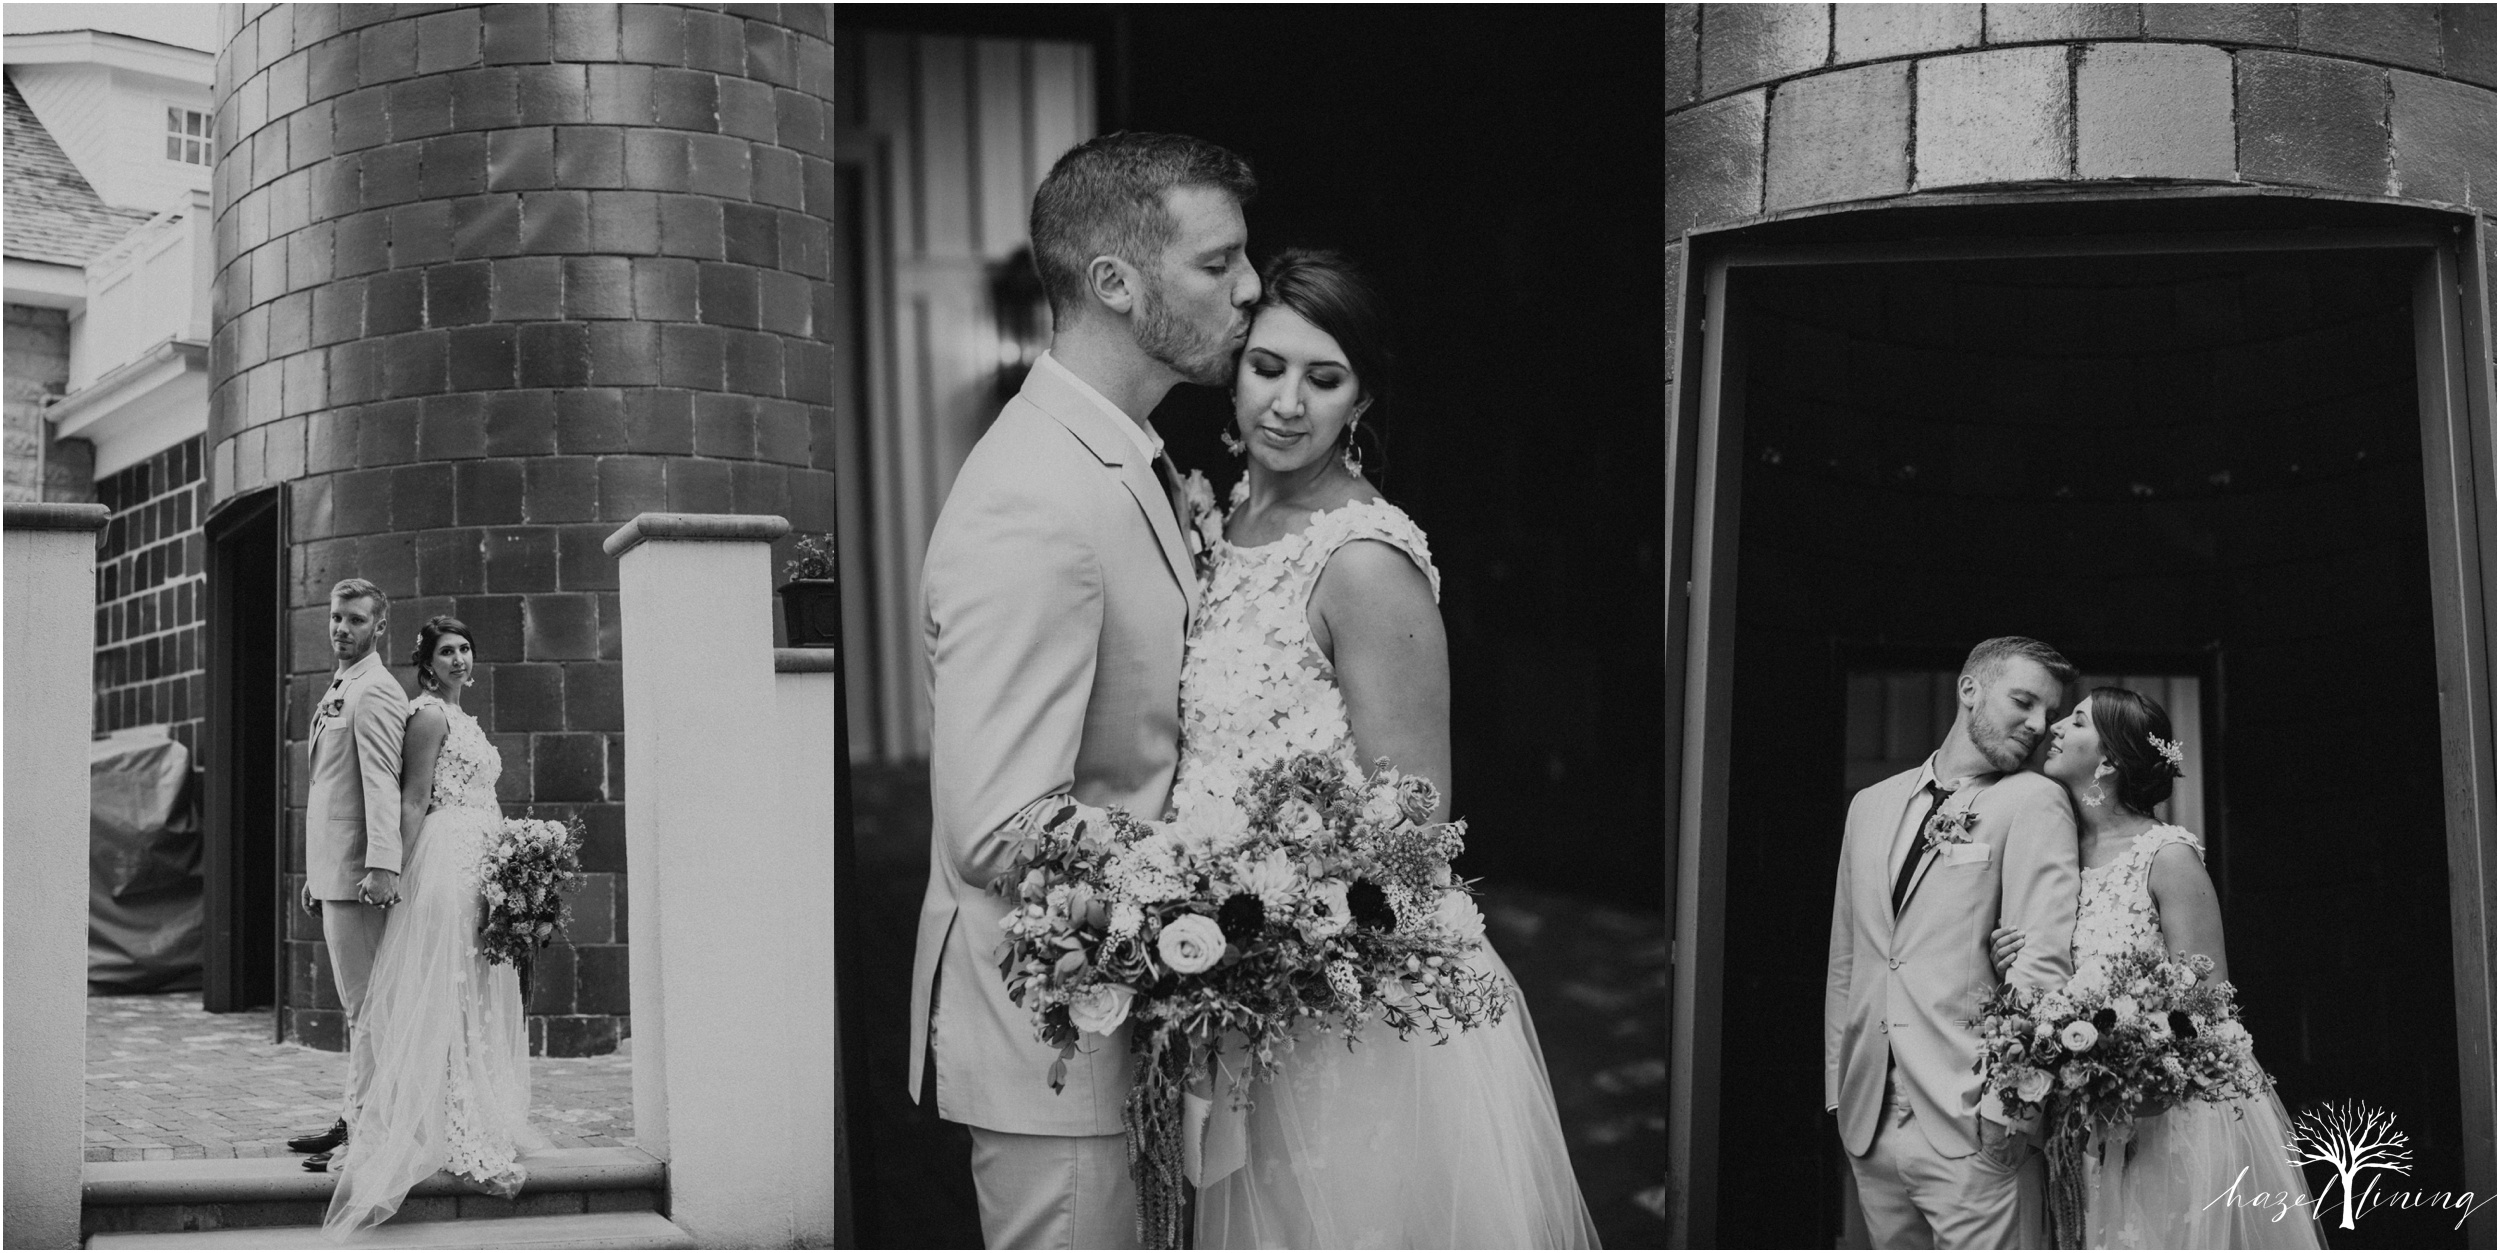 carl-chloe-the-ryland-inn-whitehouse-station-new-jersey-styled-squad-hazel-lining-photography-destination-elopement-wedding-engagement-photography_0021.jpg